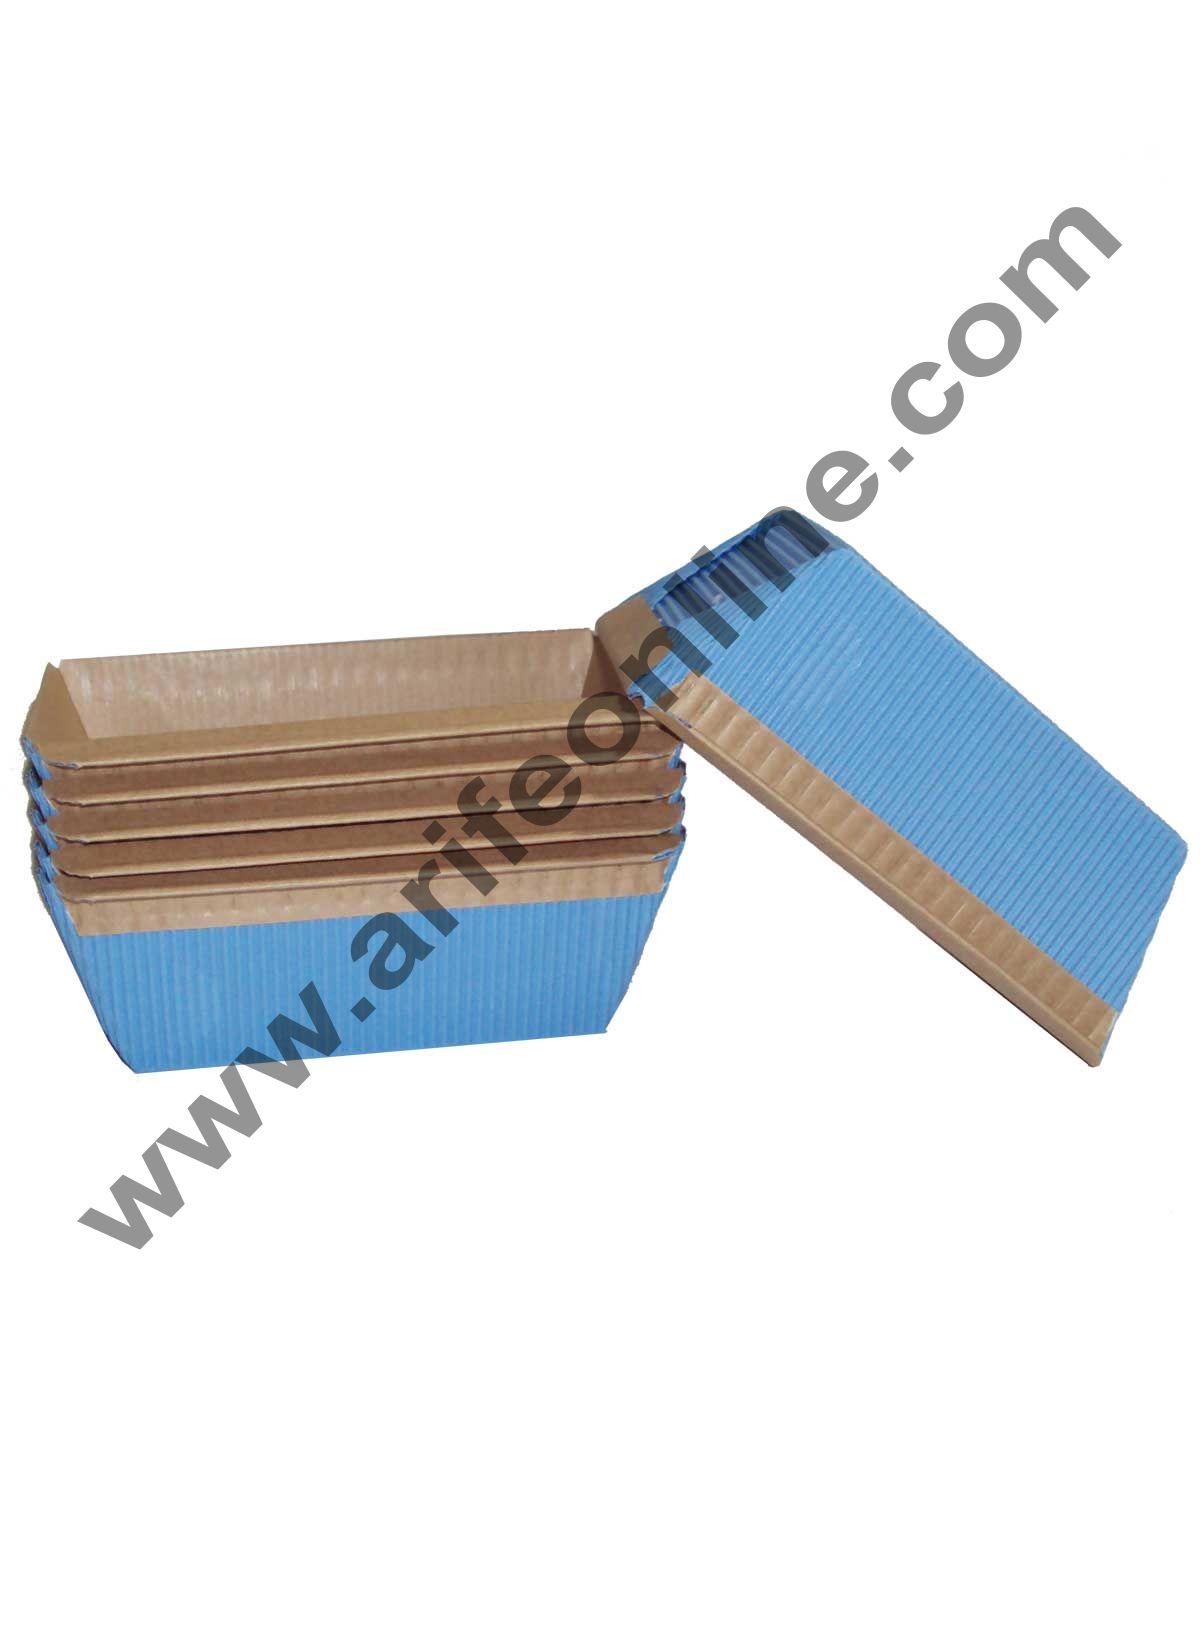 Novacart Bake & Serve Paper Baking Mould By Cake Decor - Plum Cake Mould Blue 10 Pcs